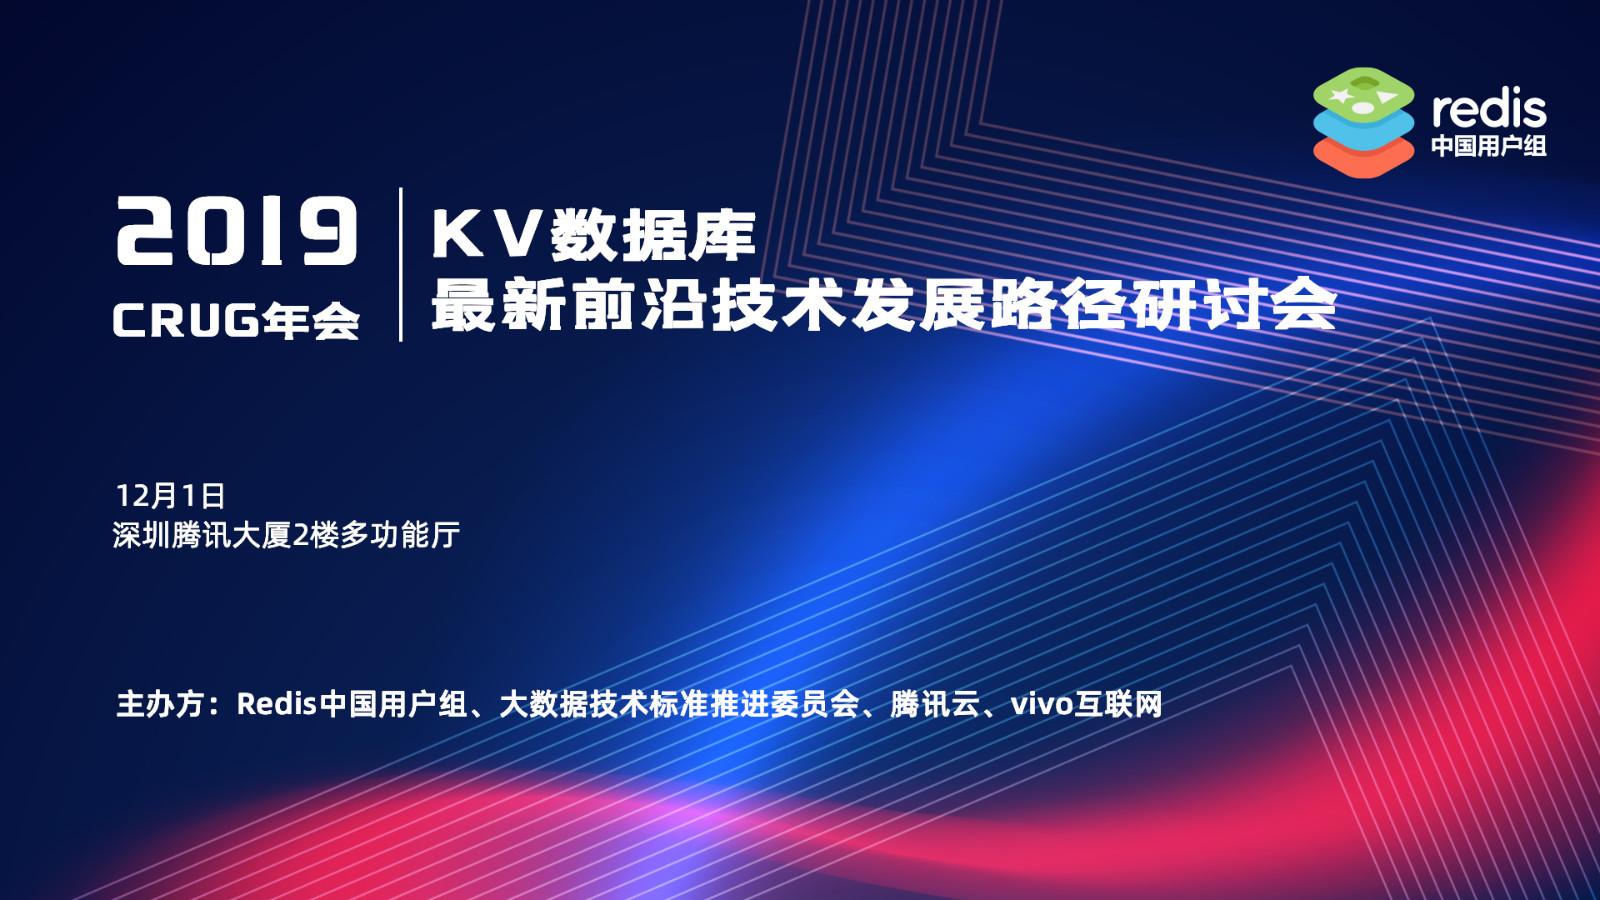 2019 CRUG年会暨KV数据库最新前沿技术发展路径研讨会